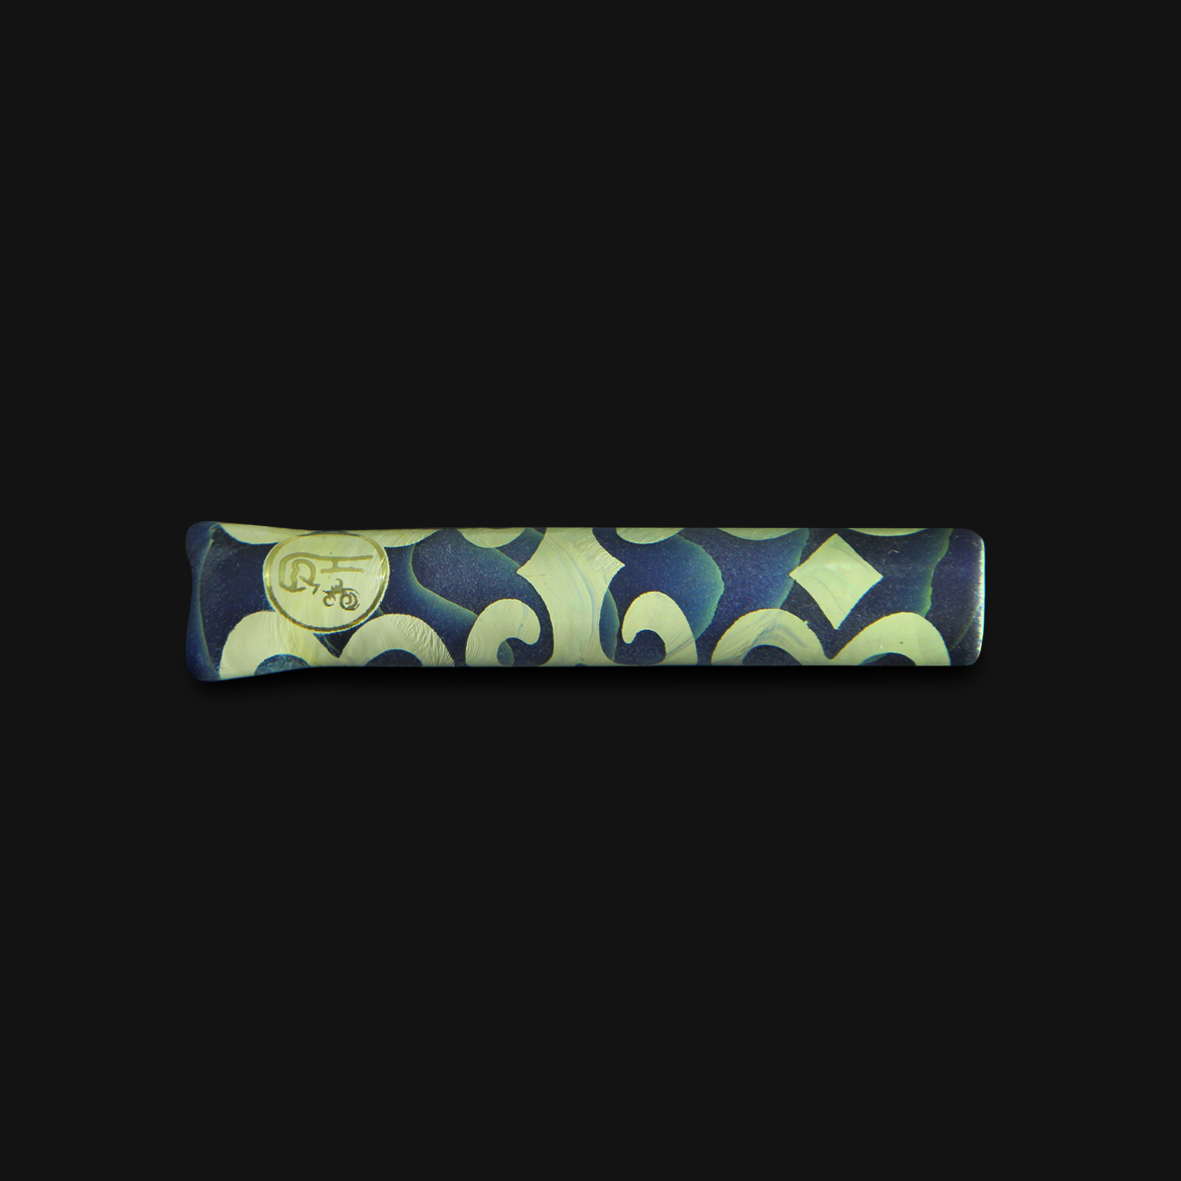 Piteira de Vidro Highblast 2 - Blue Caramel #07